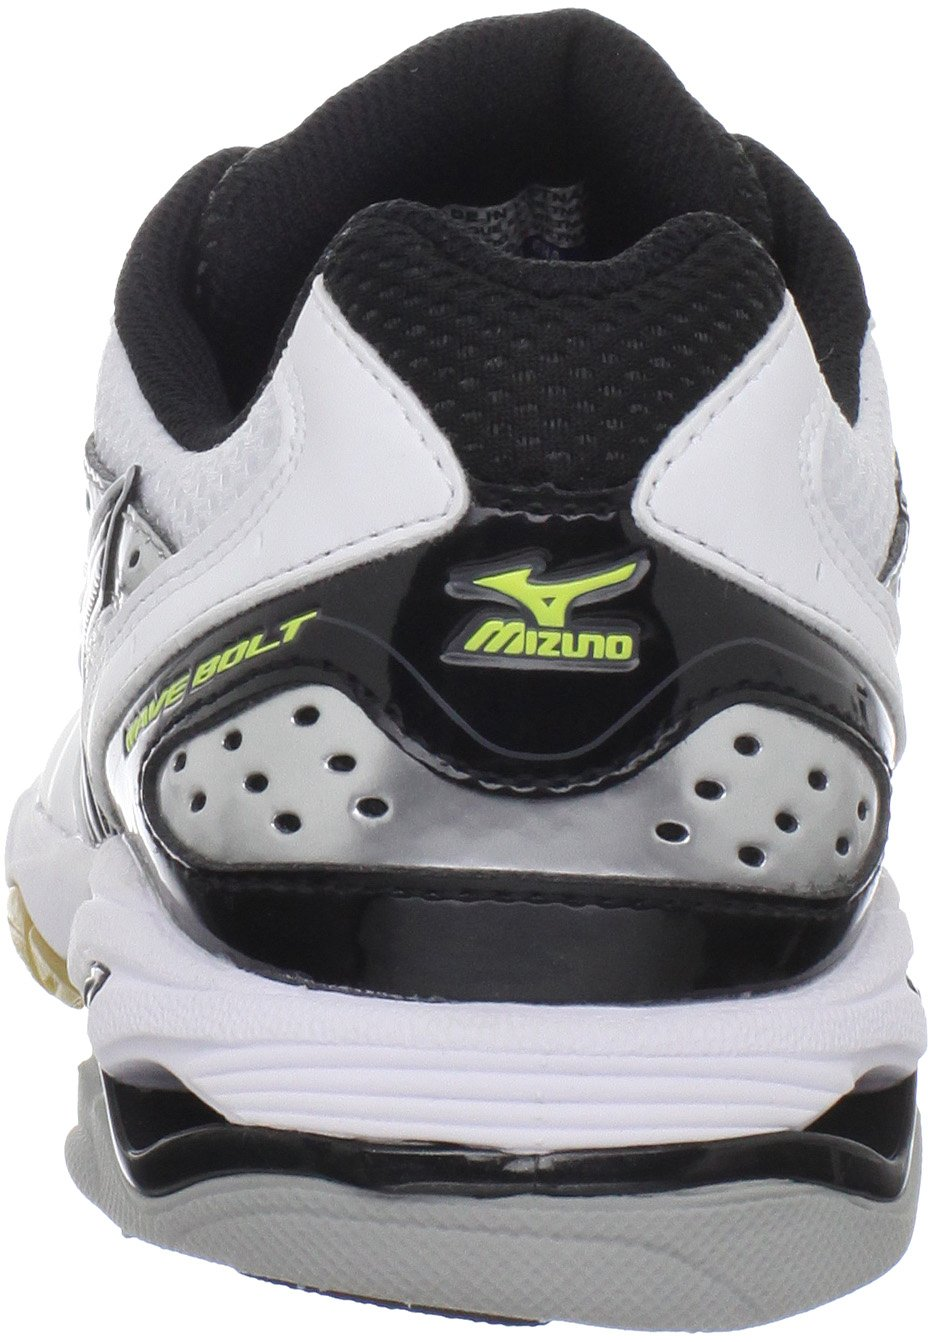 Mizuno Women's Wave Bolt Volleyball Shoe,White/Black,9 M US by Mizuno (Image #2)